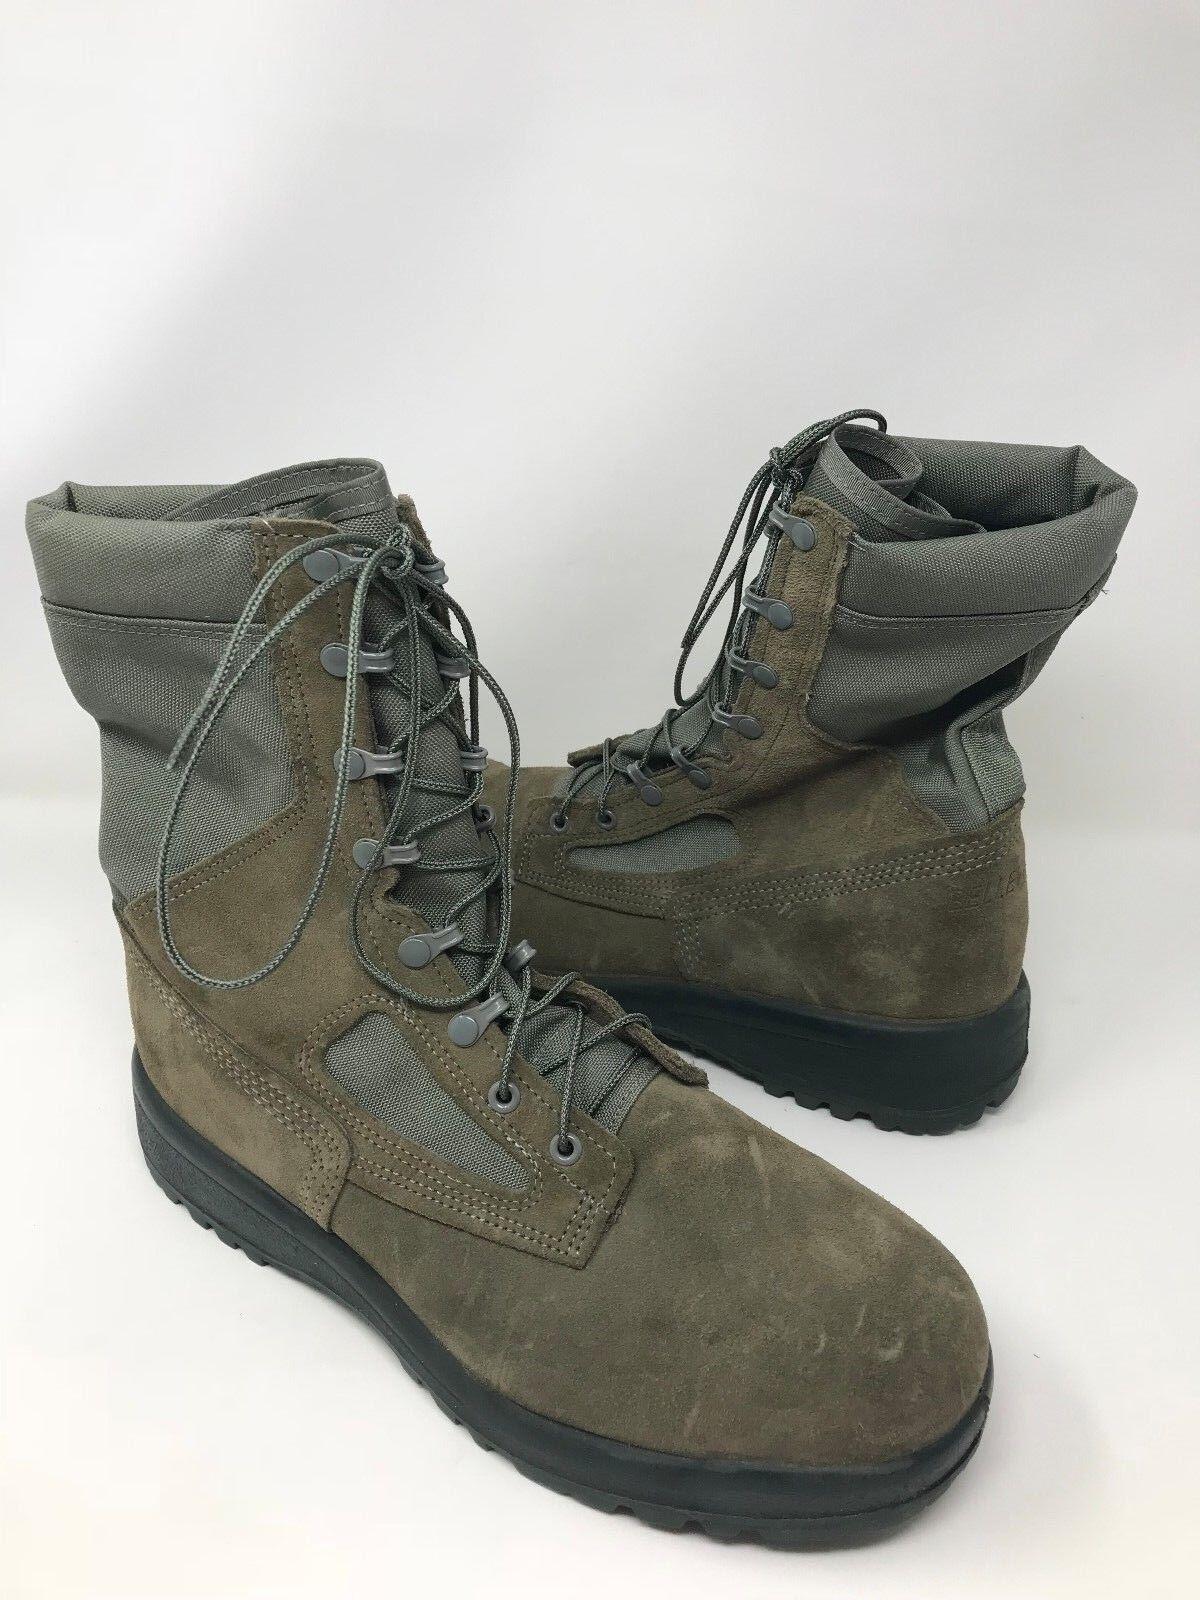 New  Damenschuhe Belleville F600 ST Hot Weather Steel Toe Combat Boot Sage M17